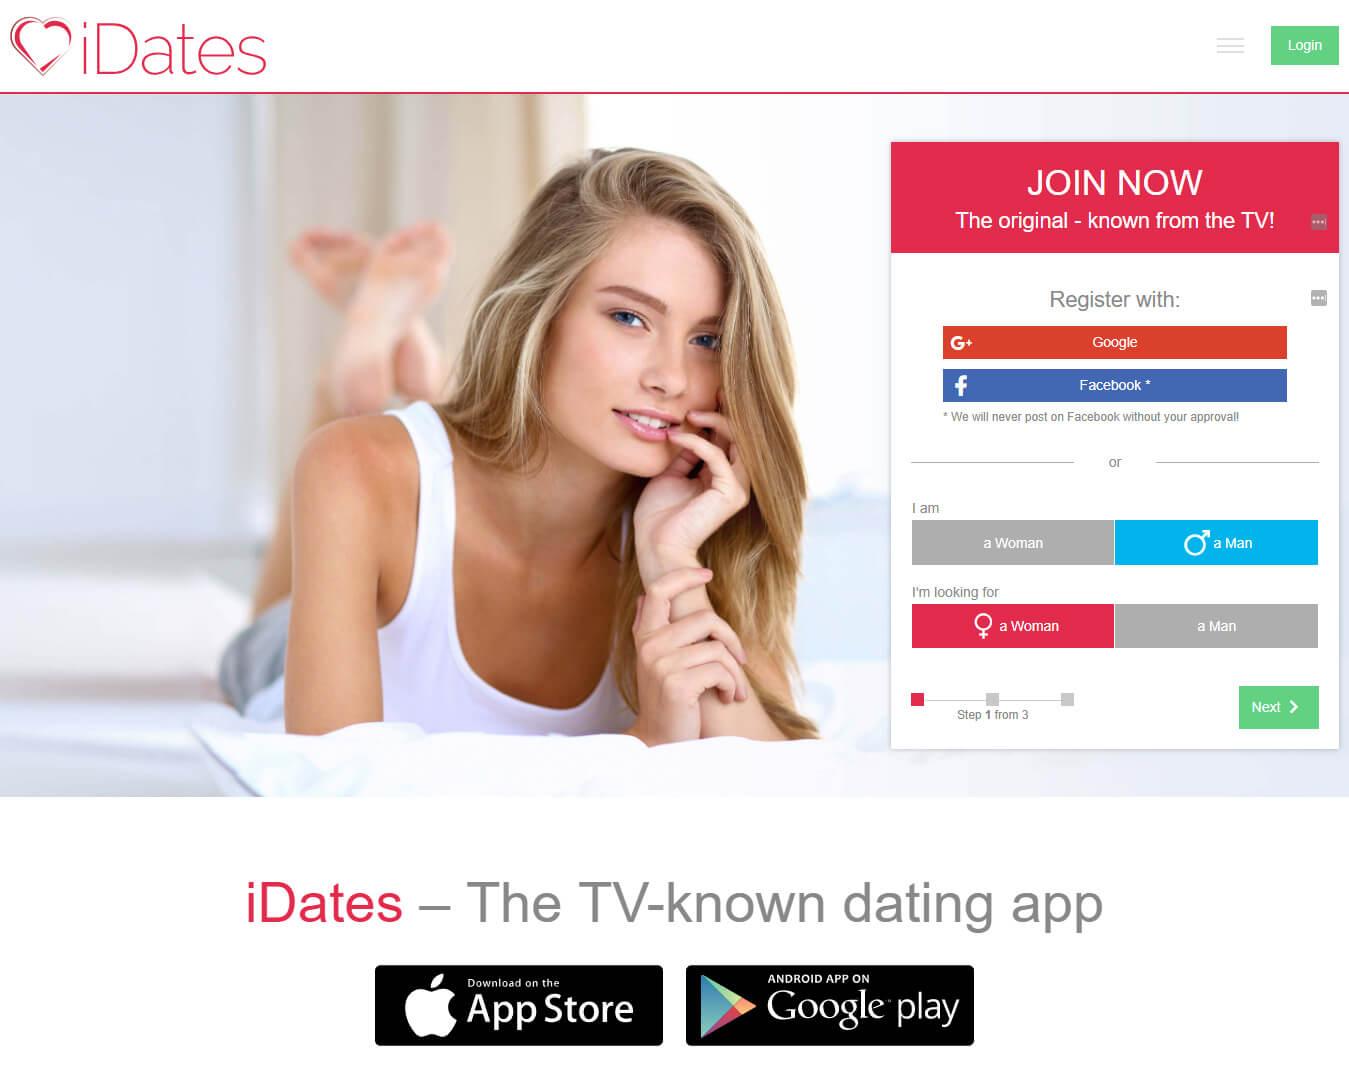 iDates Signup